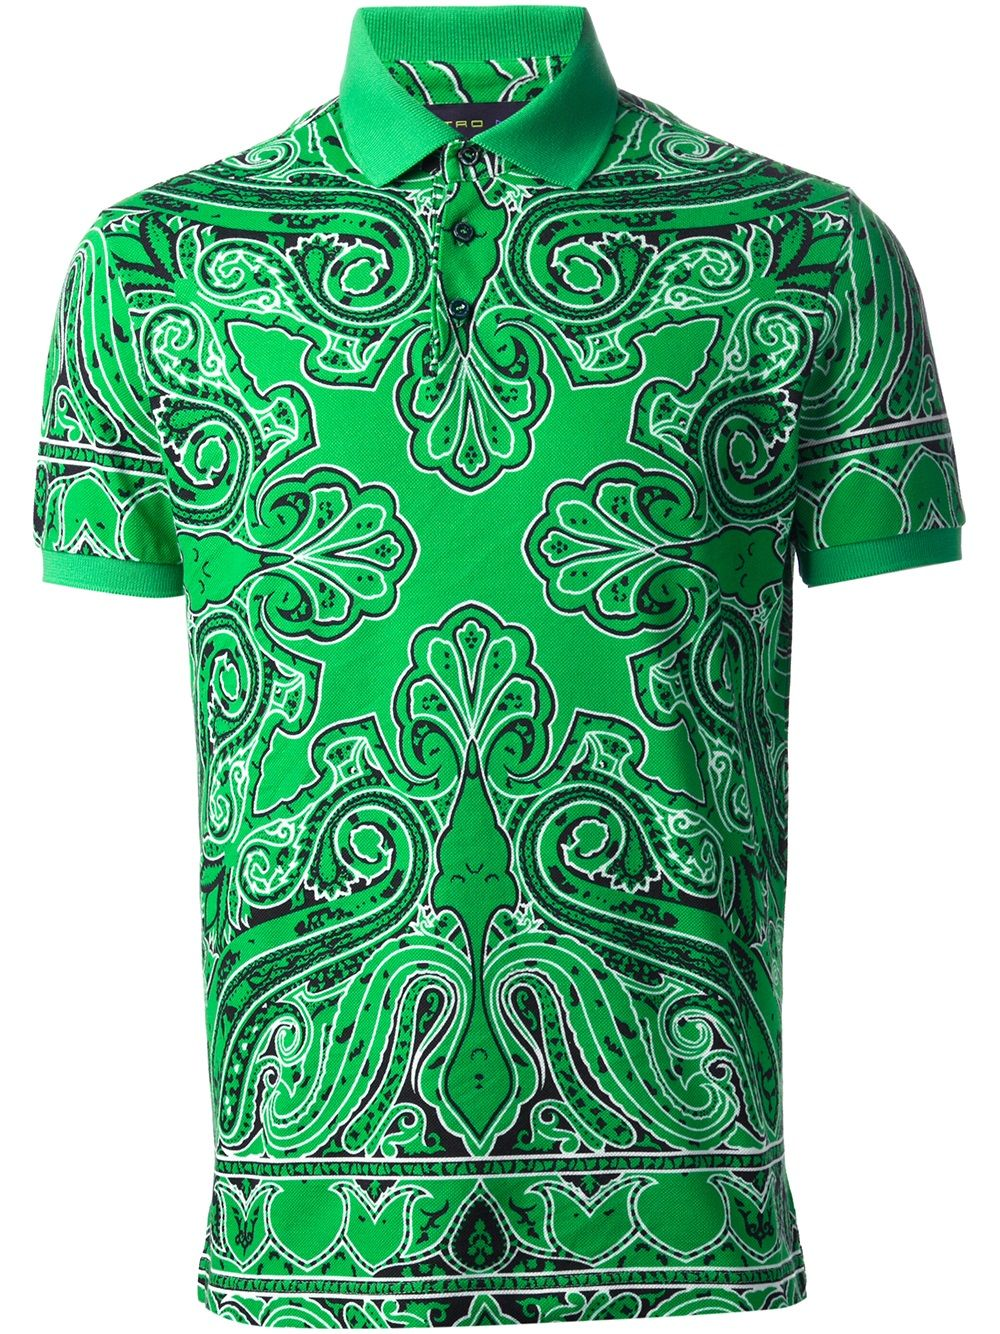 2015 new real camisa solid polo shirt mens fashion cool design short - Etro Camisa Polo Verde Estampada Fashion Clinic Farfetch Com Men S Polo Shirtsshirt